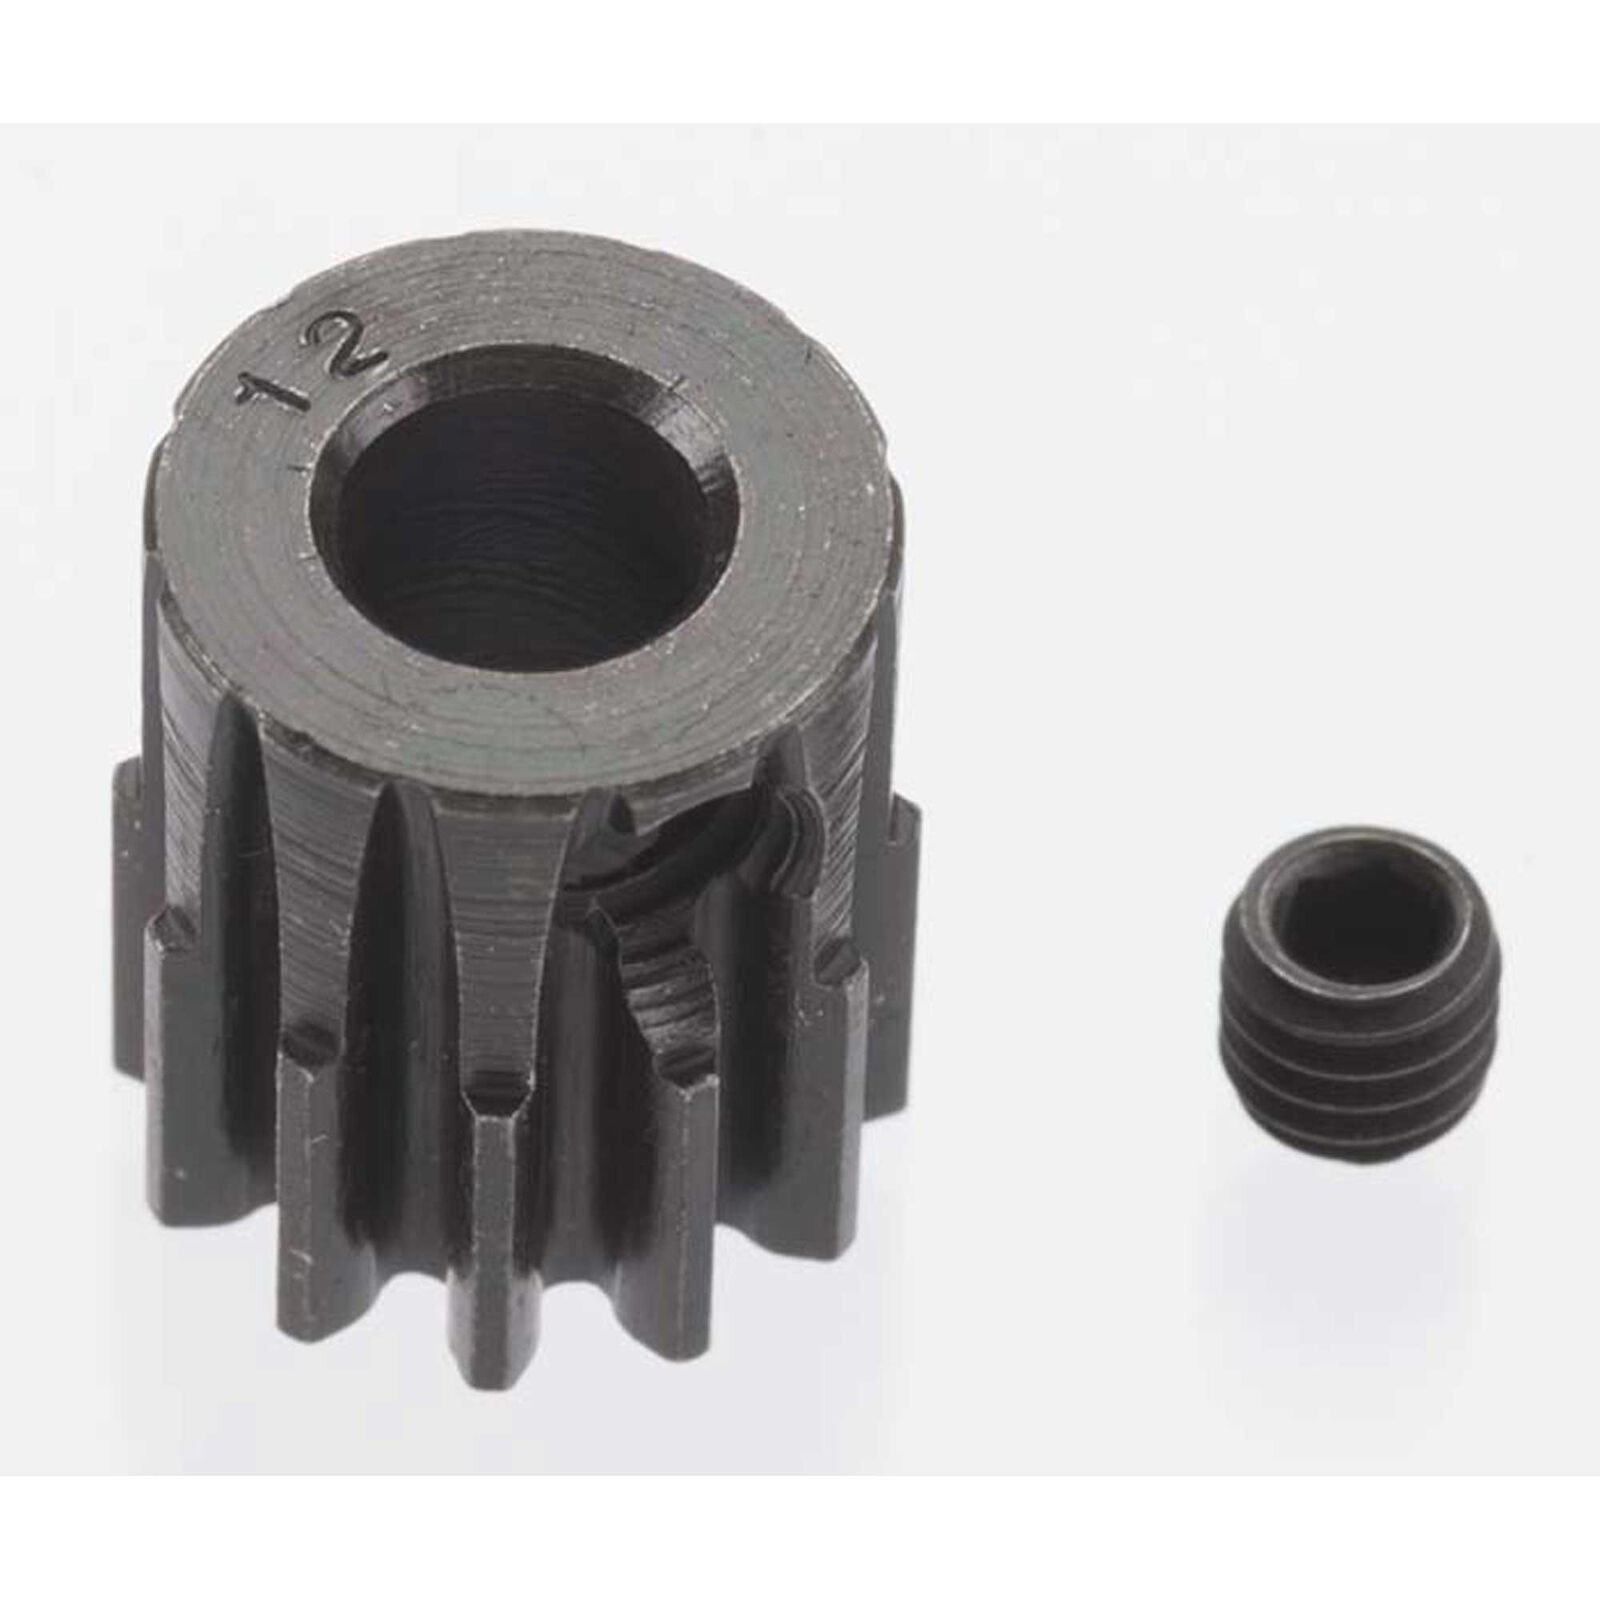 Extra Hard 12 Tooth Blackened Steel 32p Pinion, 5mm